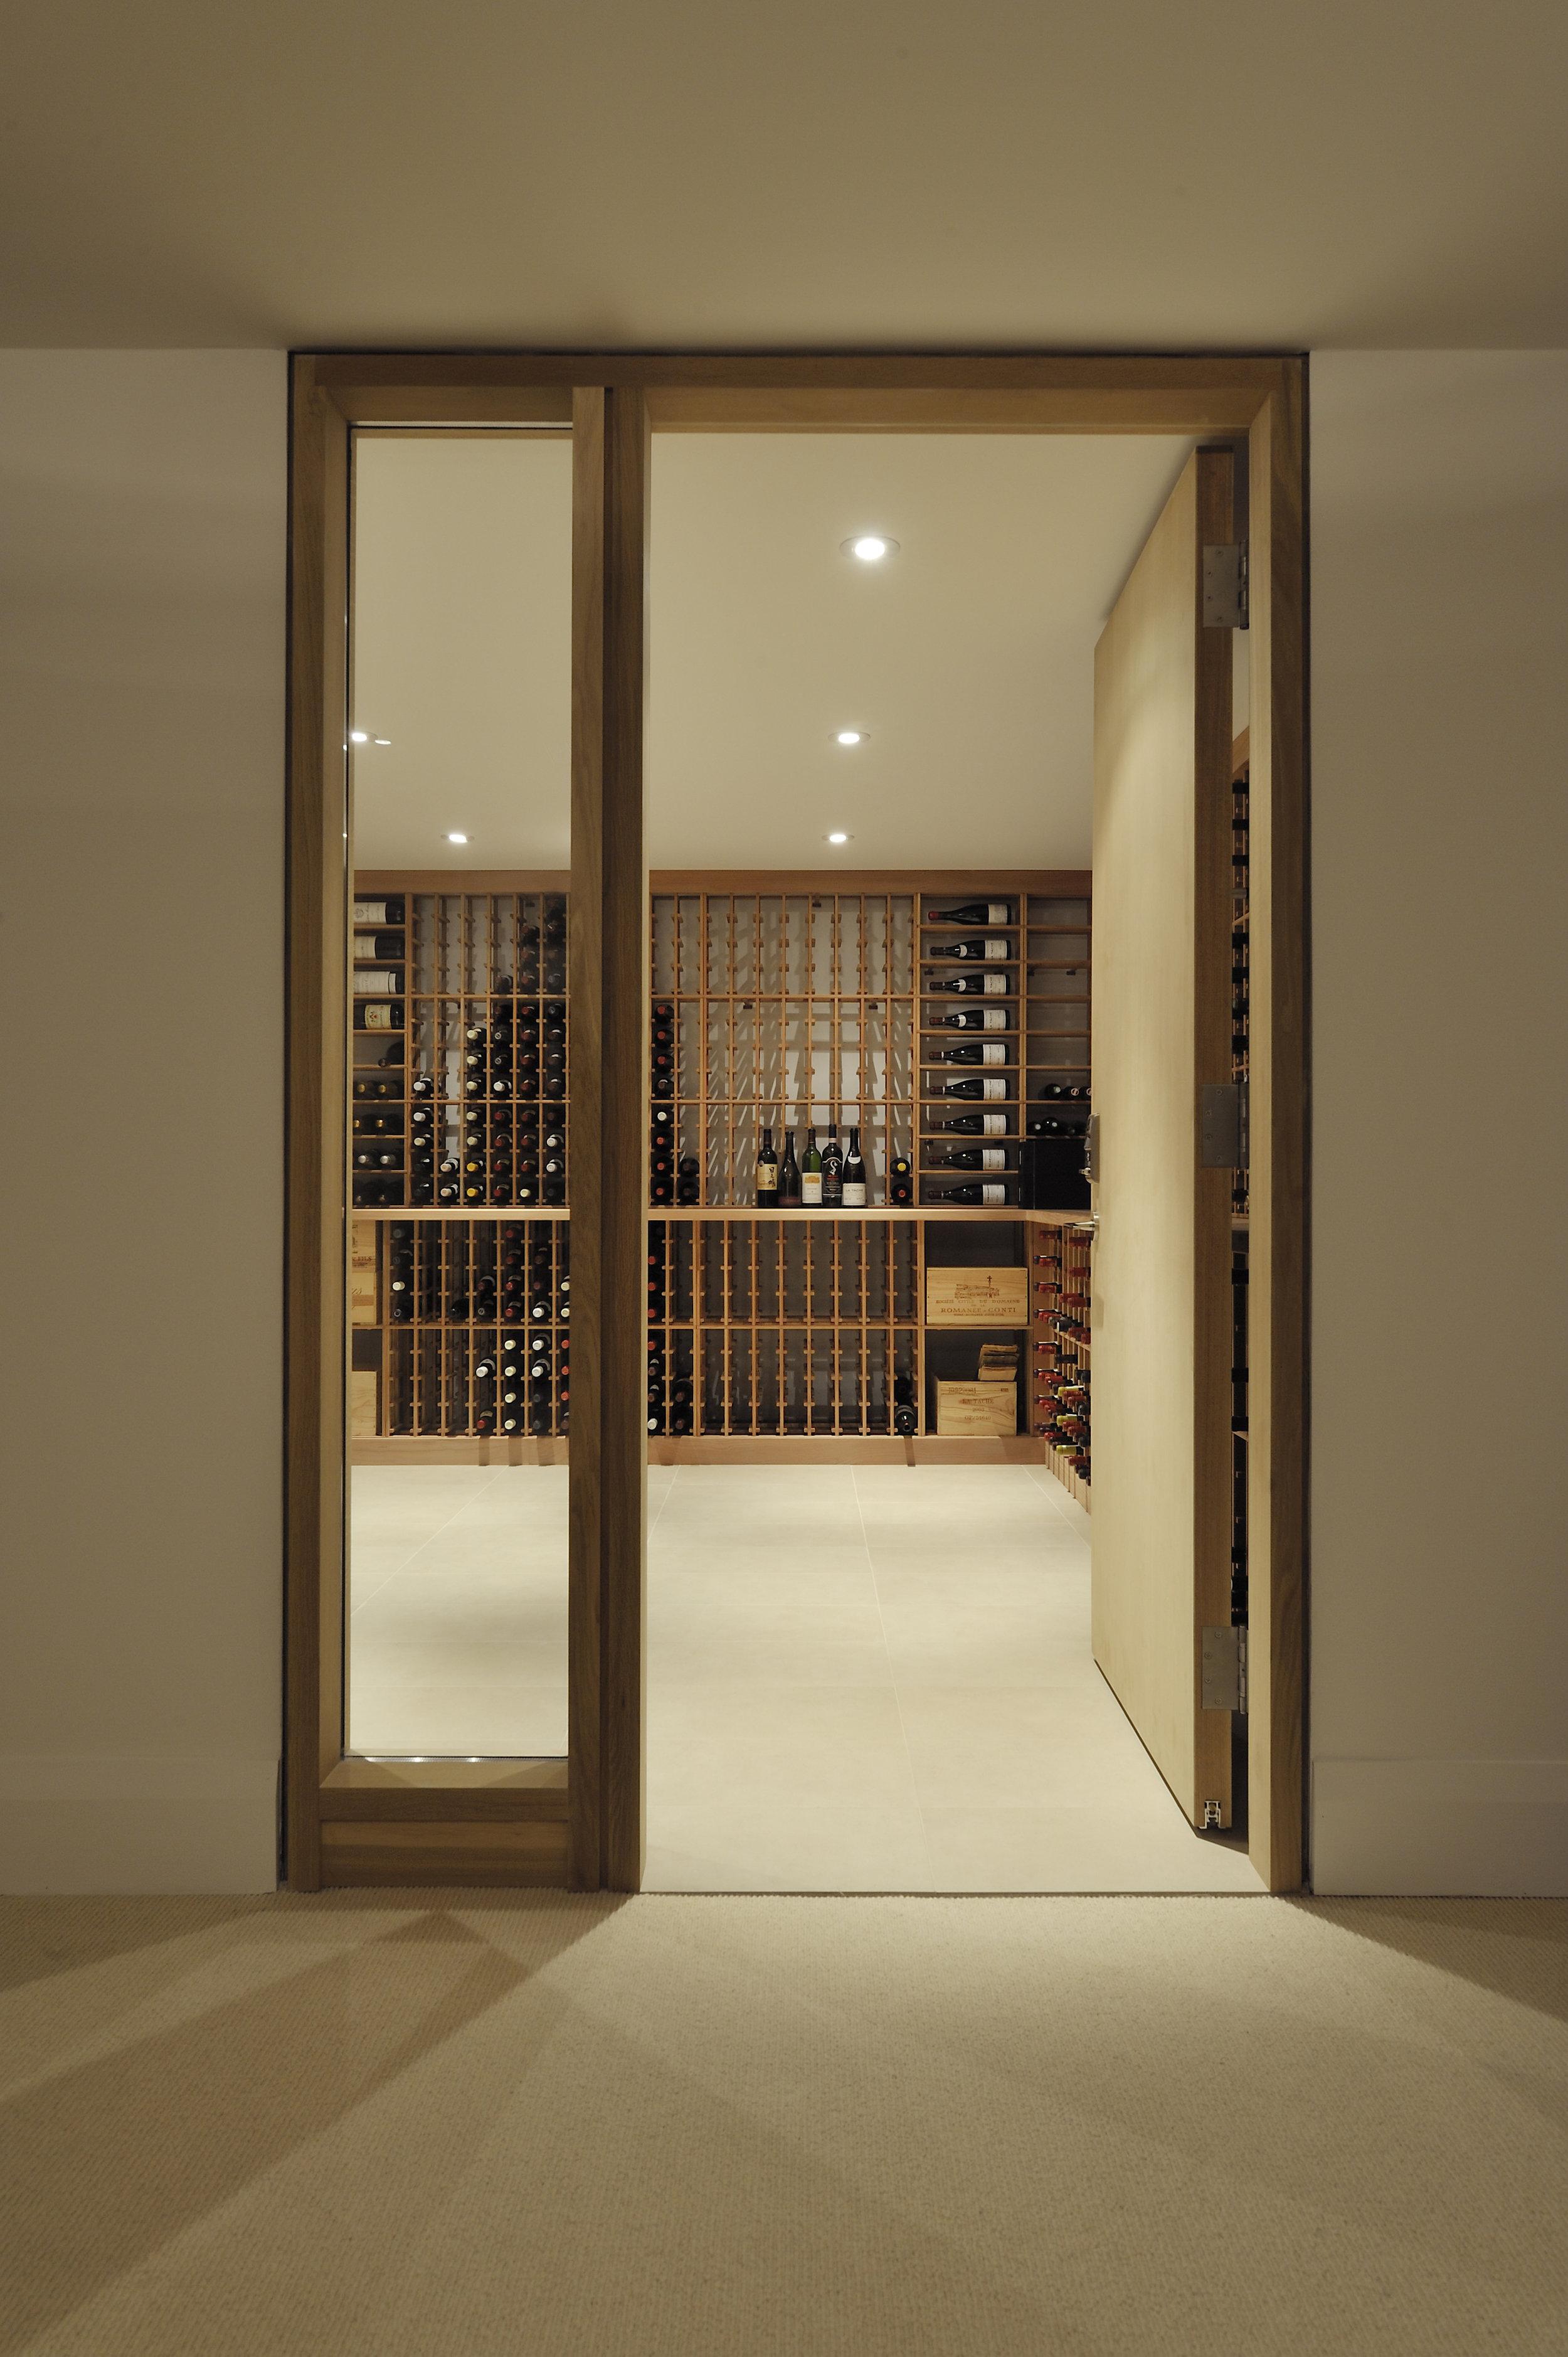 Hoggs Hollow Interior Wine Cellar